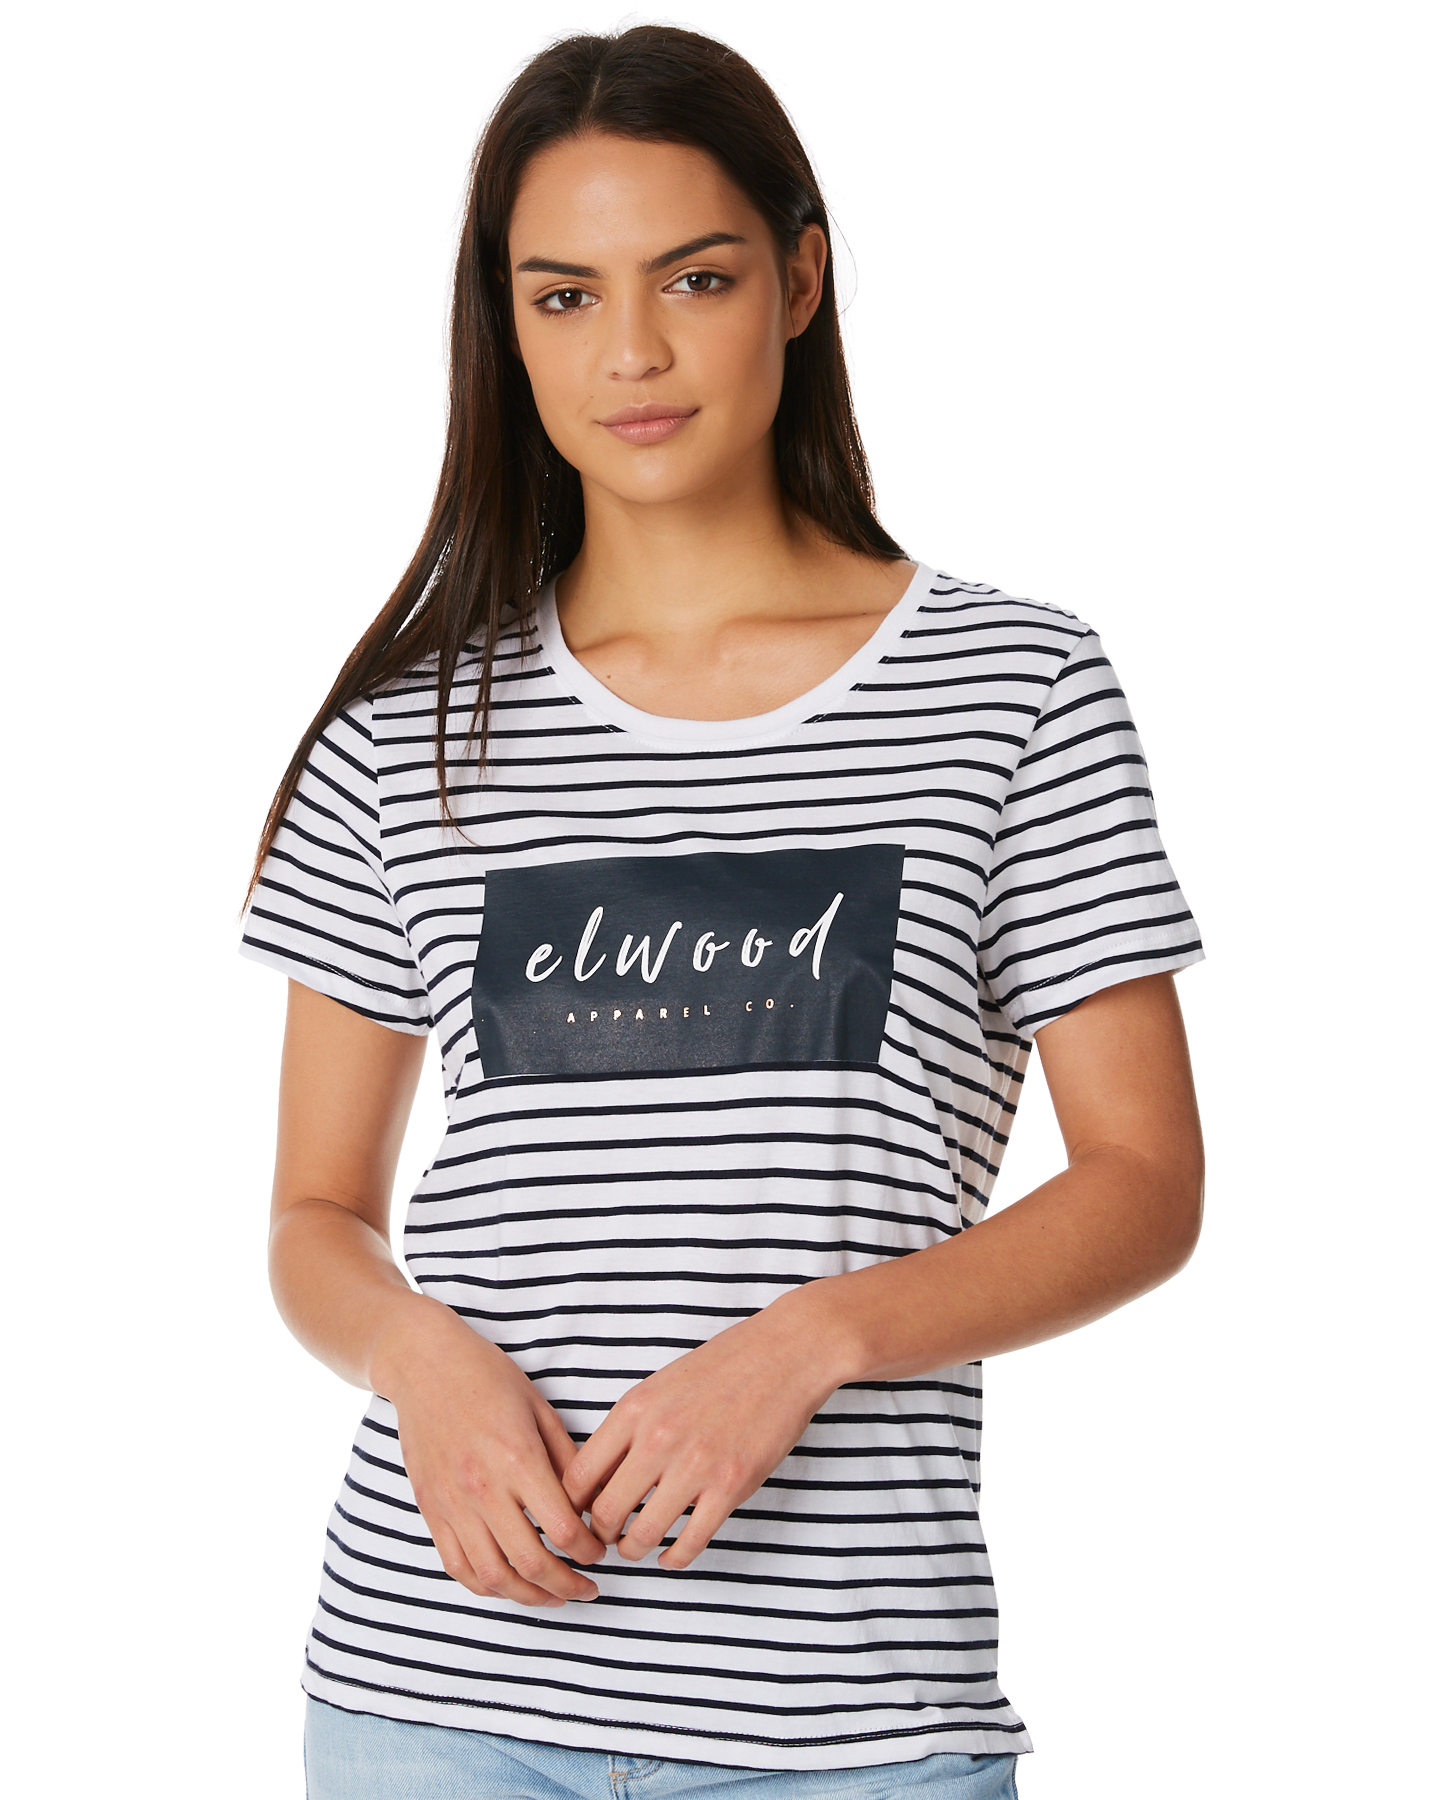 7176ba18257 New Elwood Women's Jenna Tee Short Sleeve Cotton Soft Rayon Stripe ...